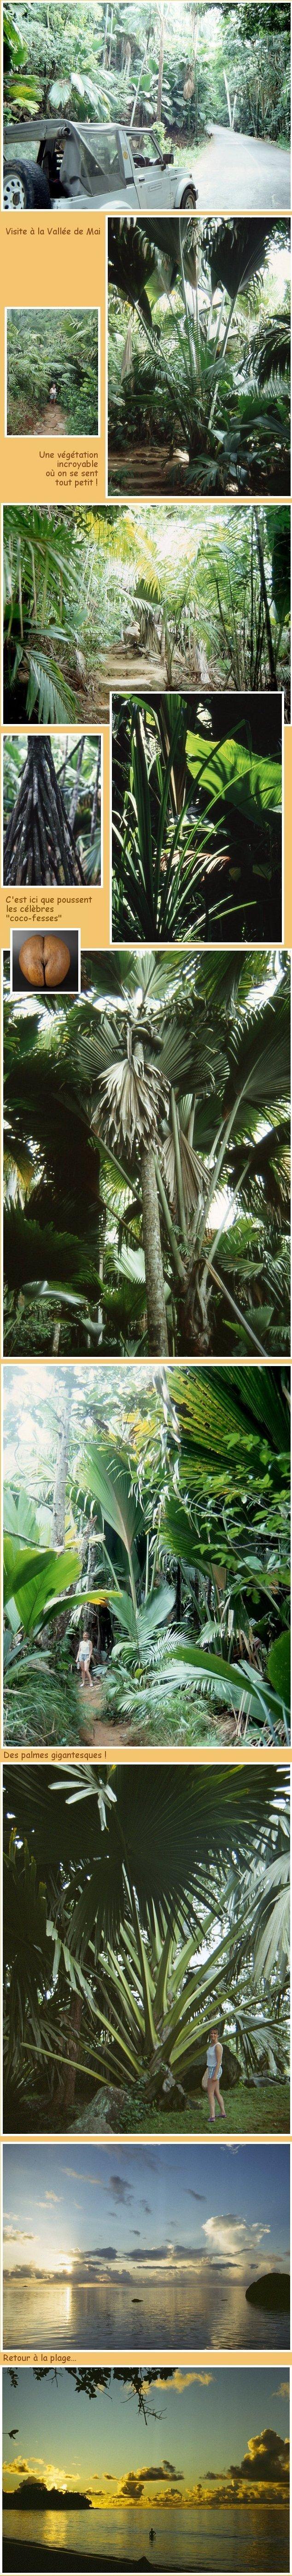 Les Seychelles - 6